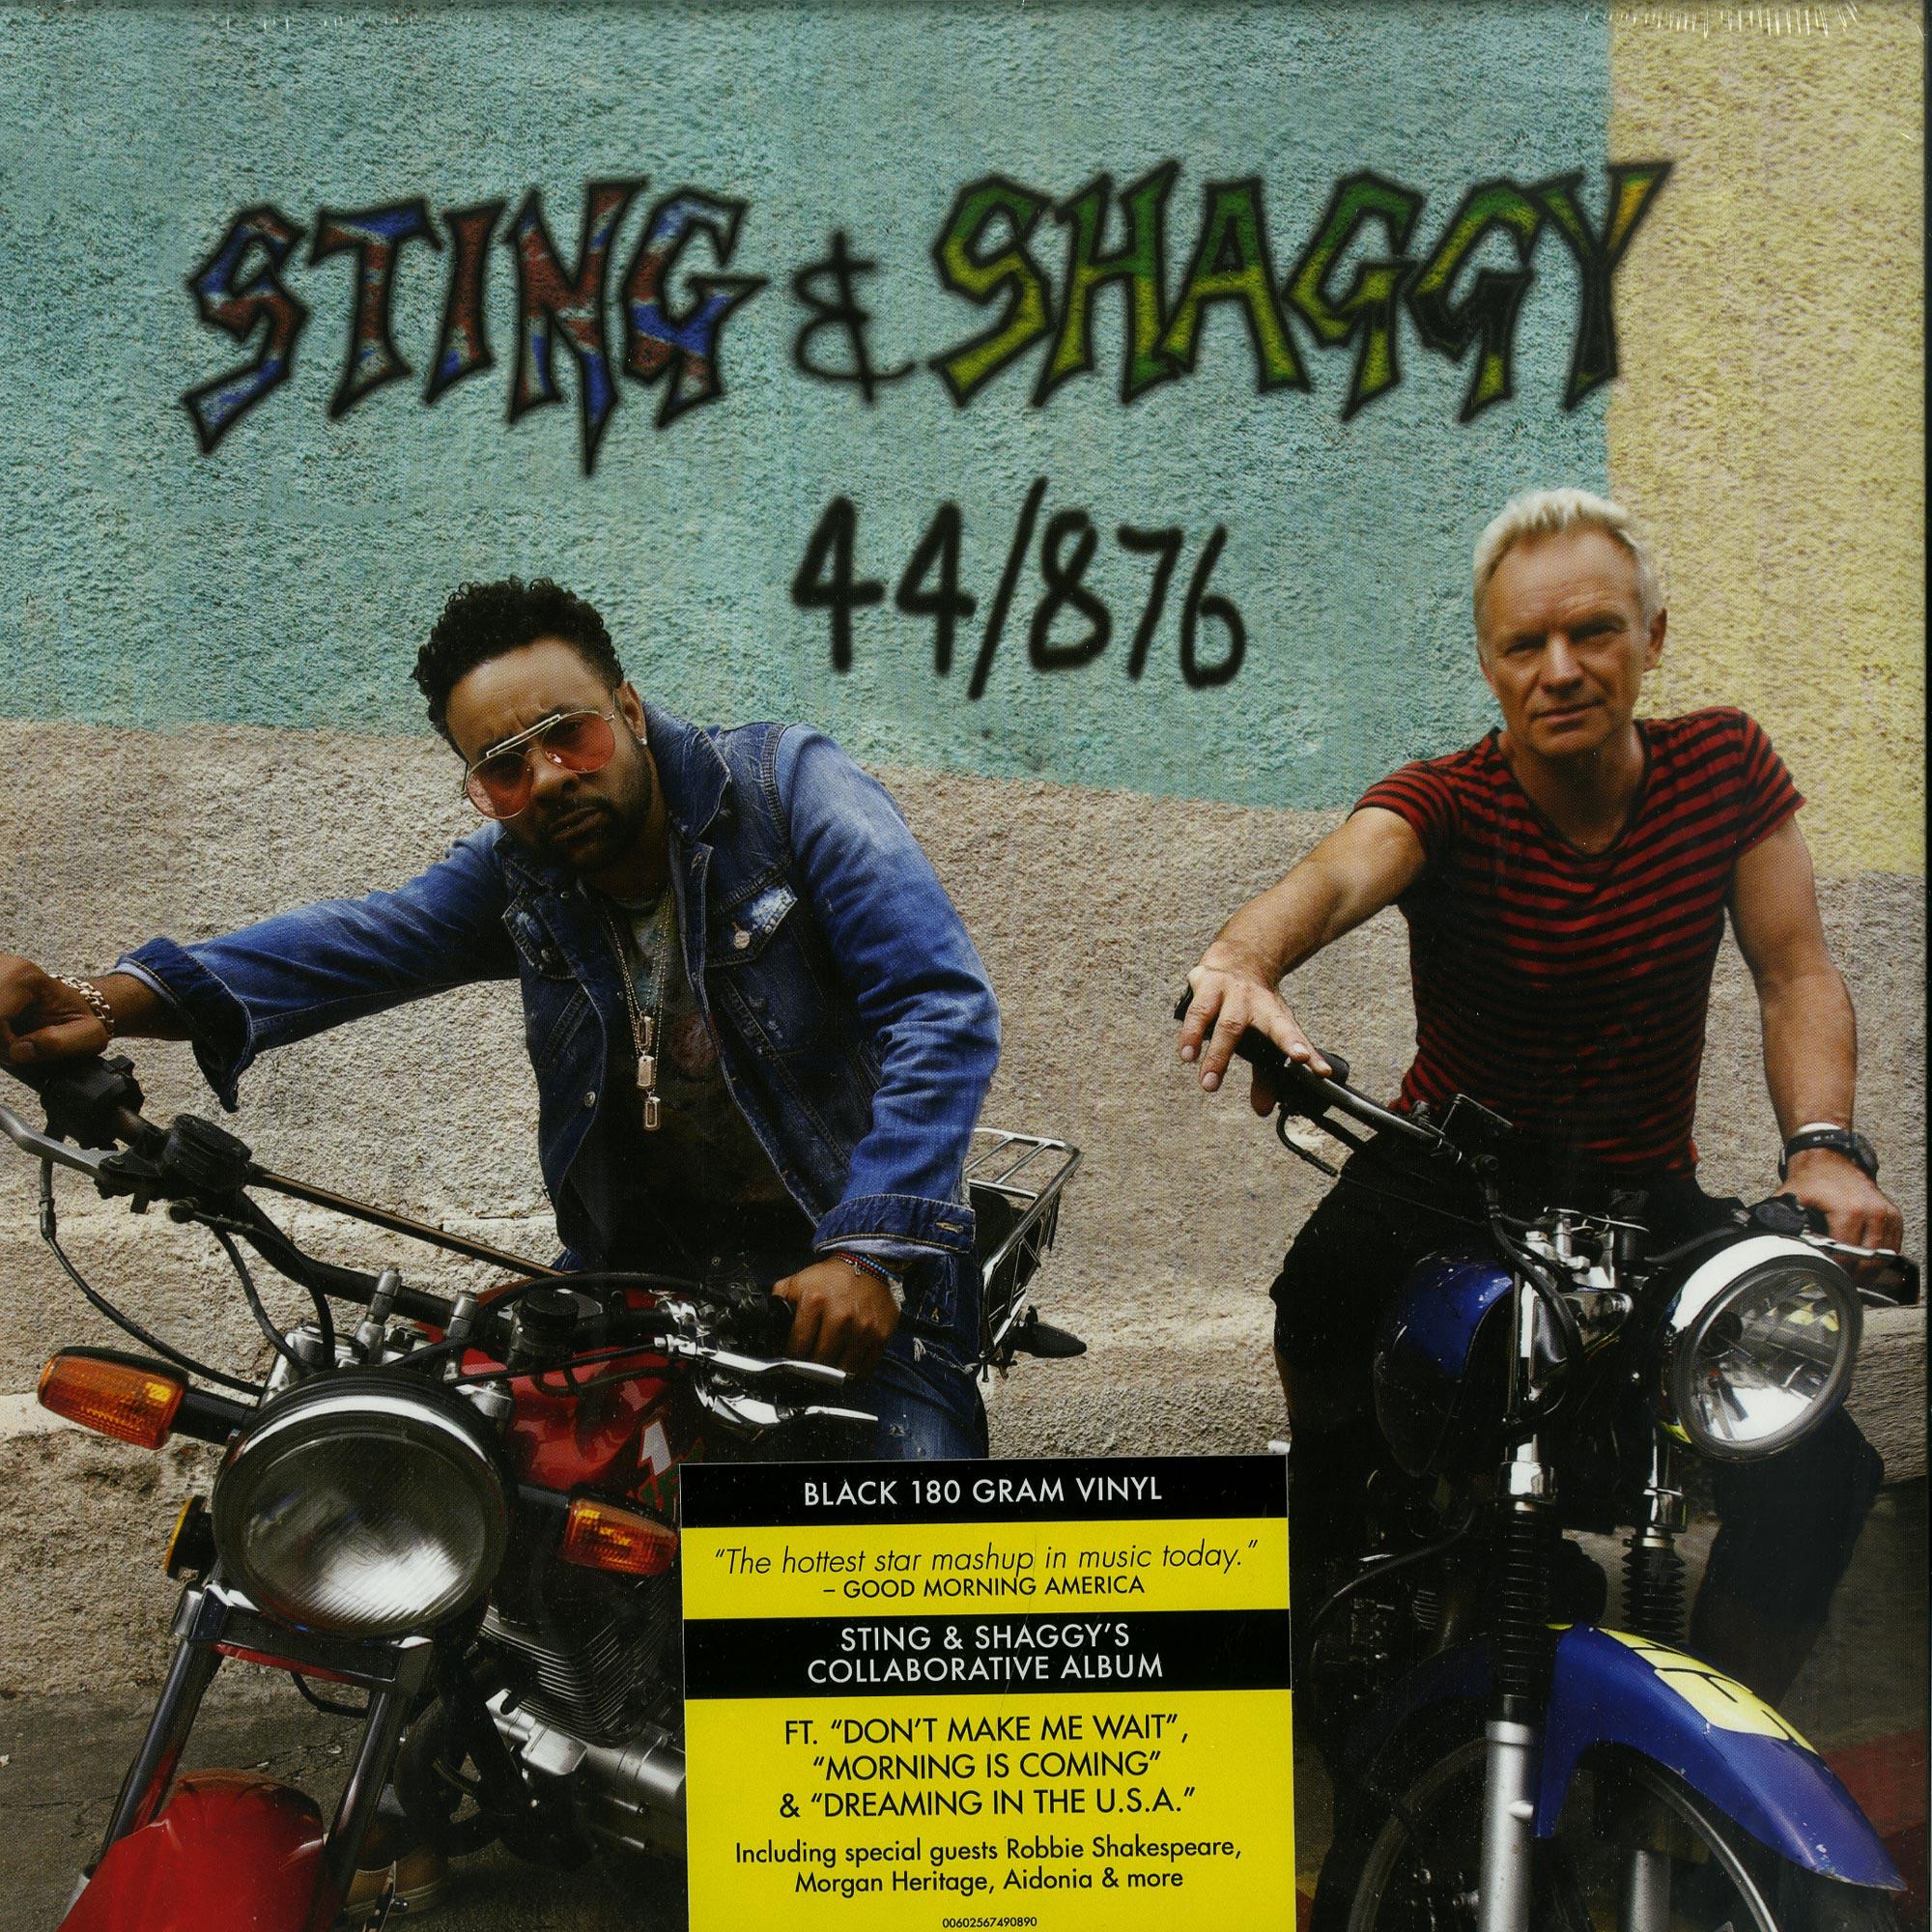 Sting & Shaggy - 44/876